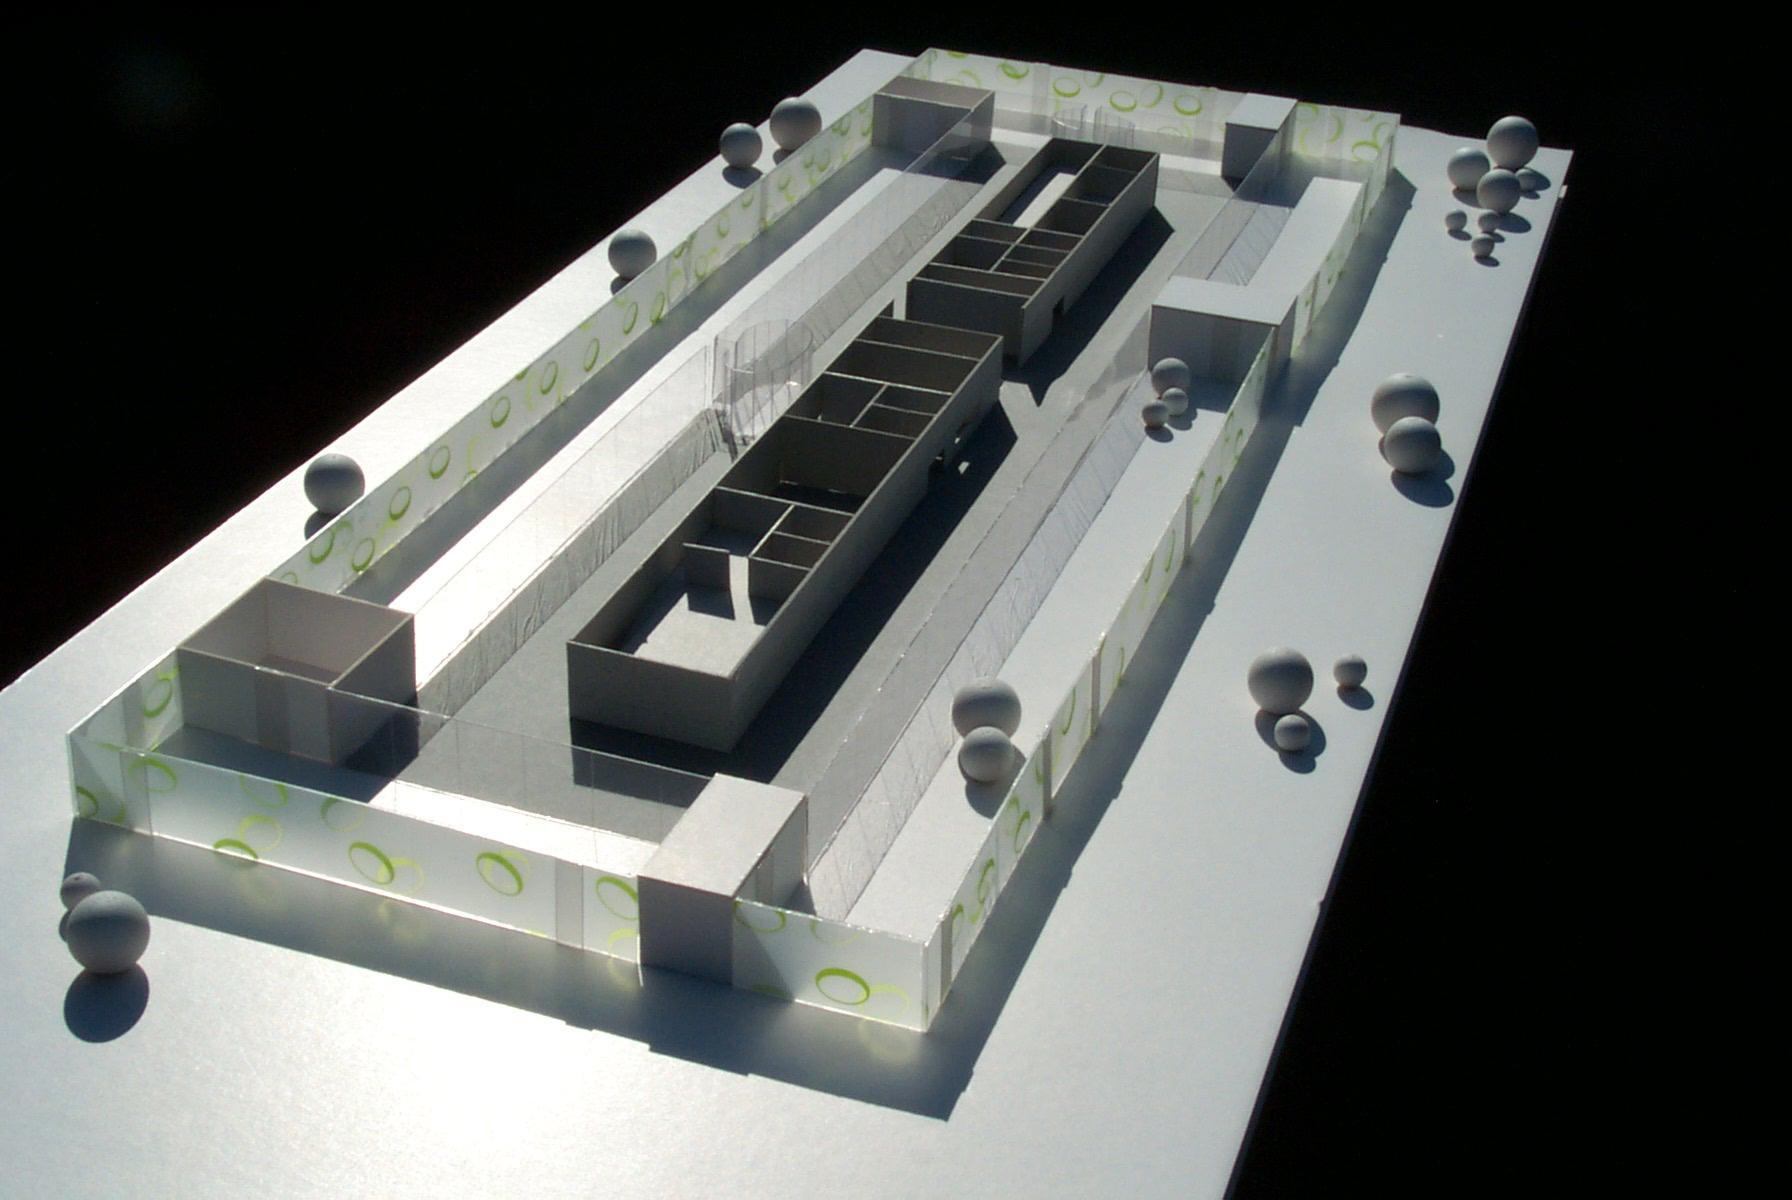 Ramon Haindl - Freie Entwürfe / case studies